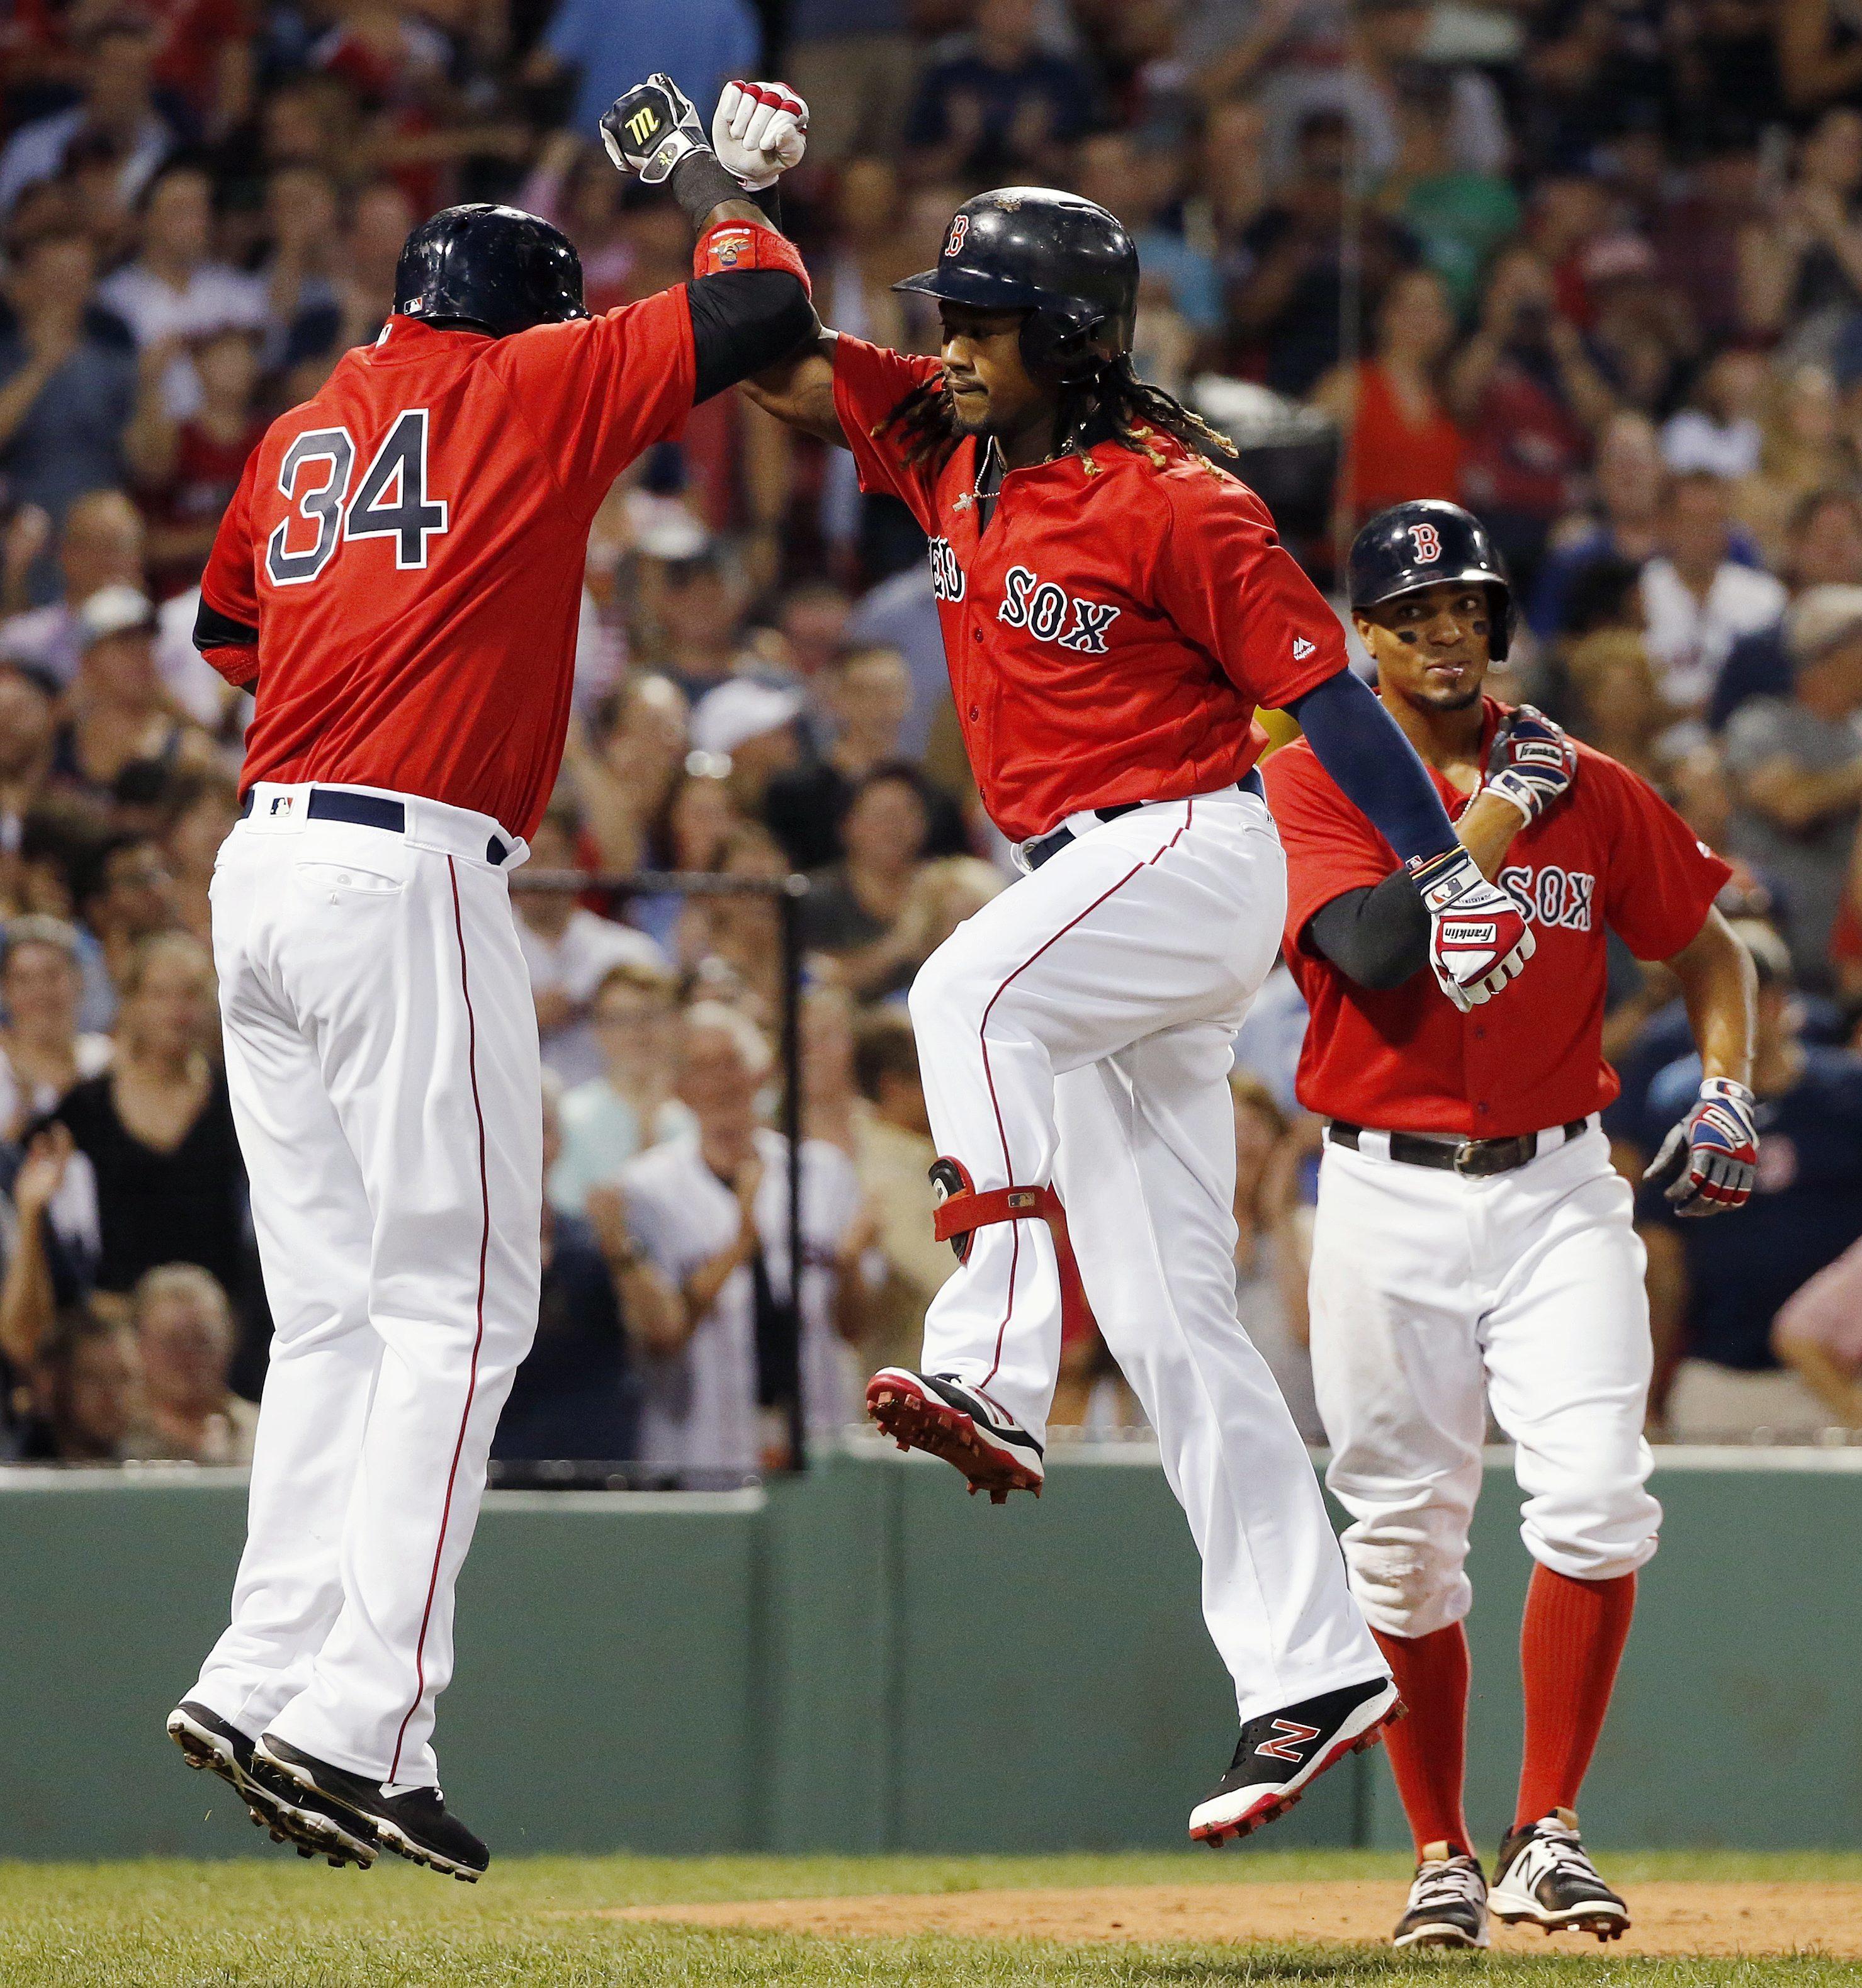 Boston Red Sox's Hanley Ramirez, center, celebrates his three-run home run that scored David Ortiz (34) and Xander Bogaerts, right, during the second inning of a baseball game against the Arizona Diamondbacks in Boston, Friday, Aug. 12, 2016. (AP Photo/Mi